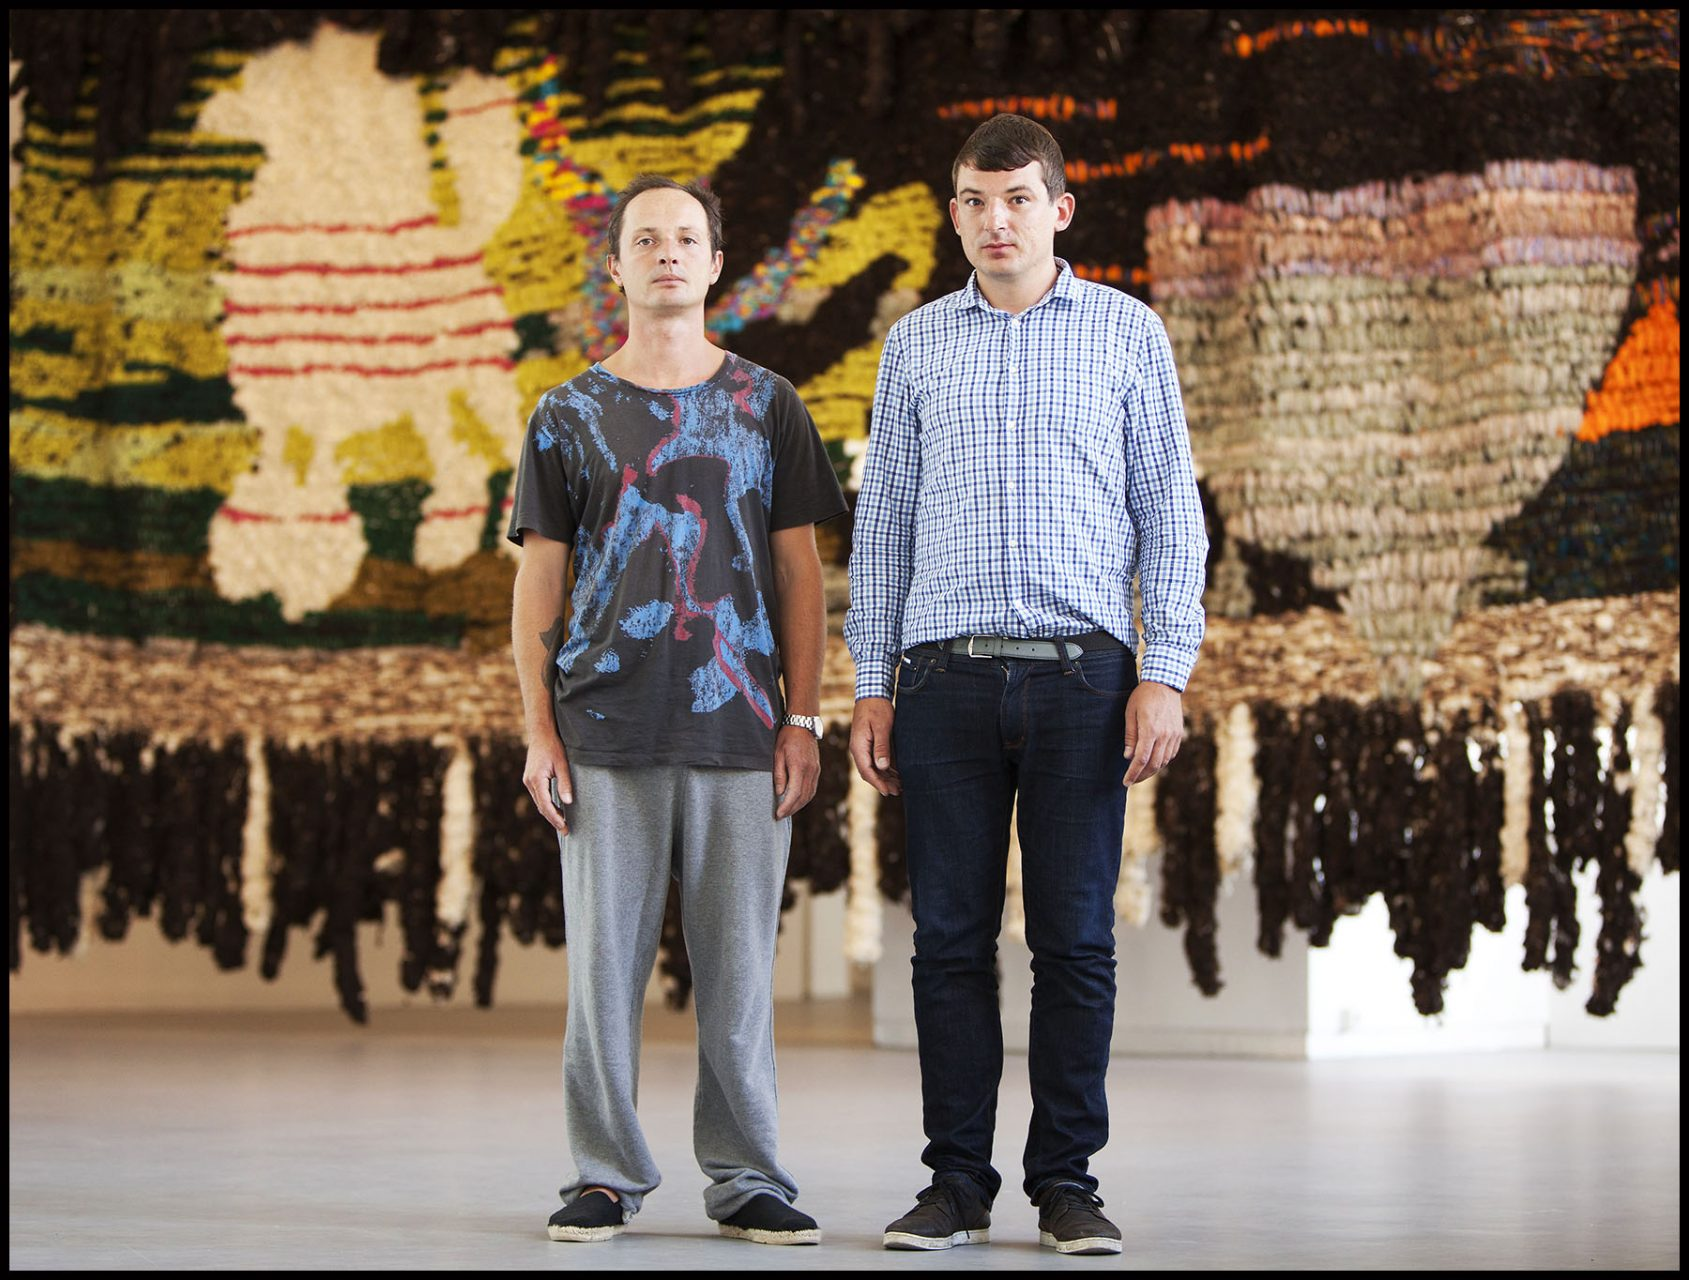 Gregory Gicquel et Daniel DEWAR, artistes plasticiens